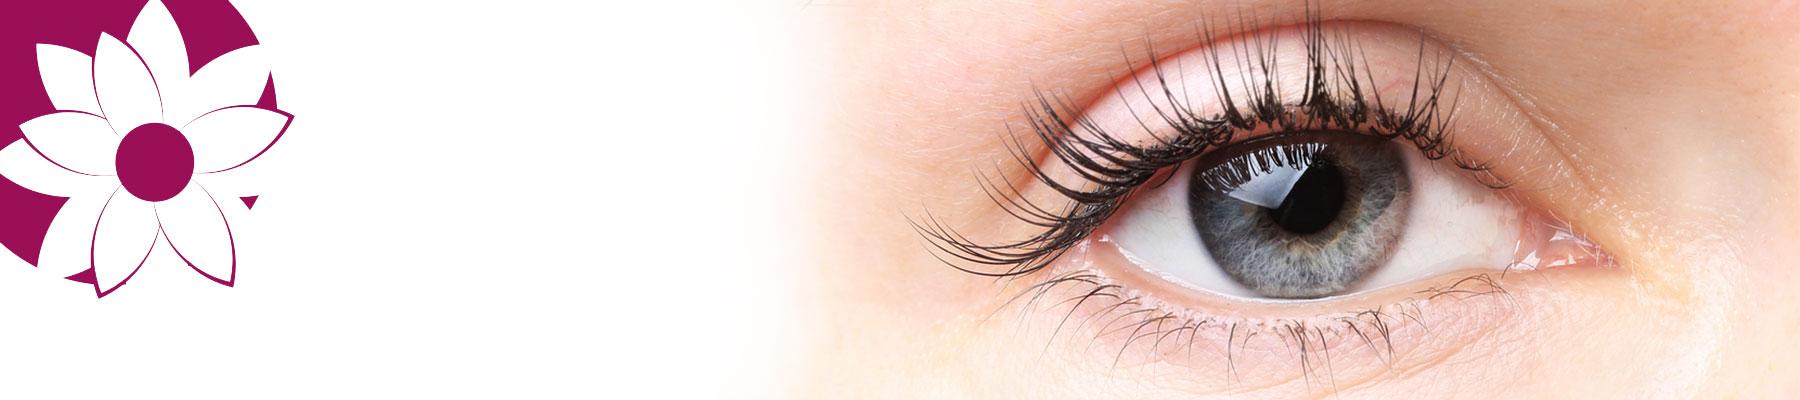 Augenlidstraffung ohne OP: Plasma Pen Lifting